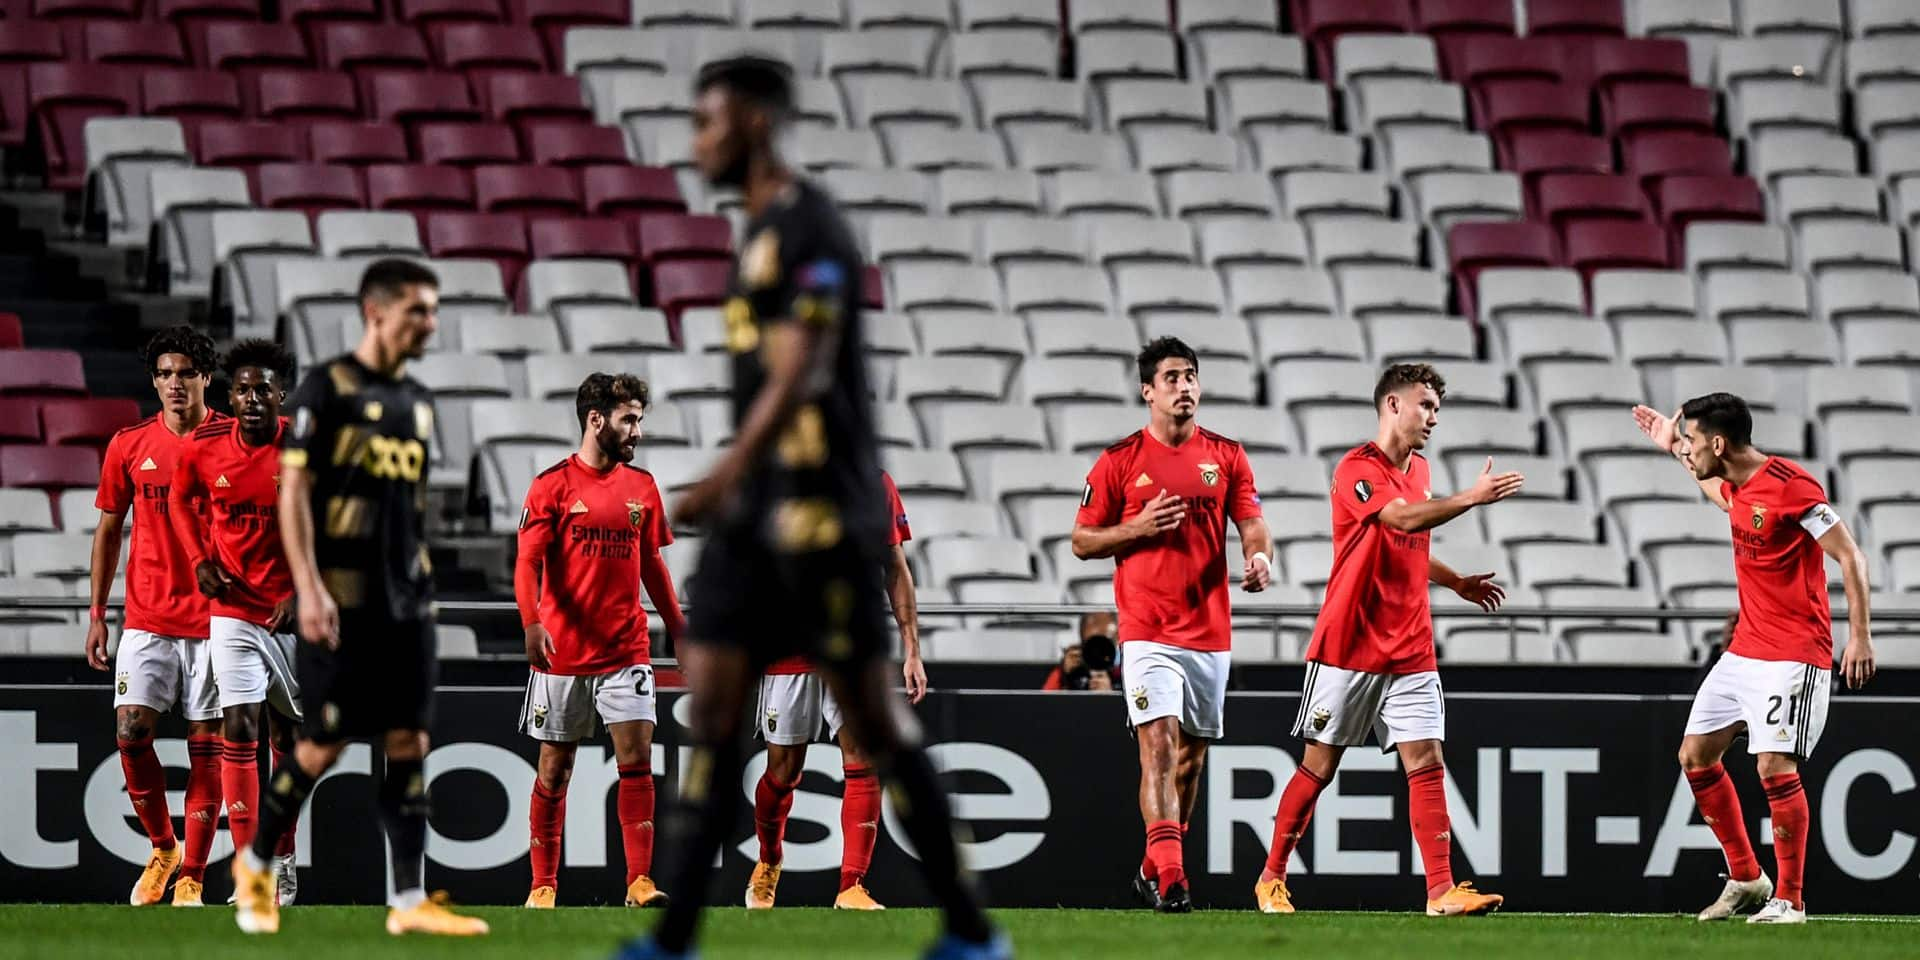 Le Standard s'incline lourdement à Benfica (3-0)